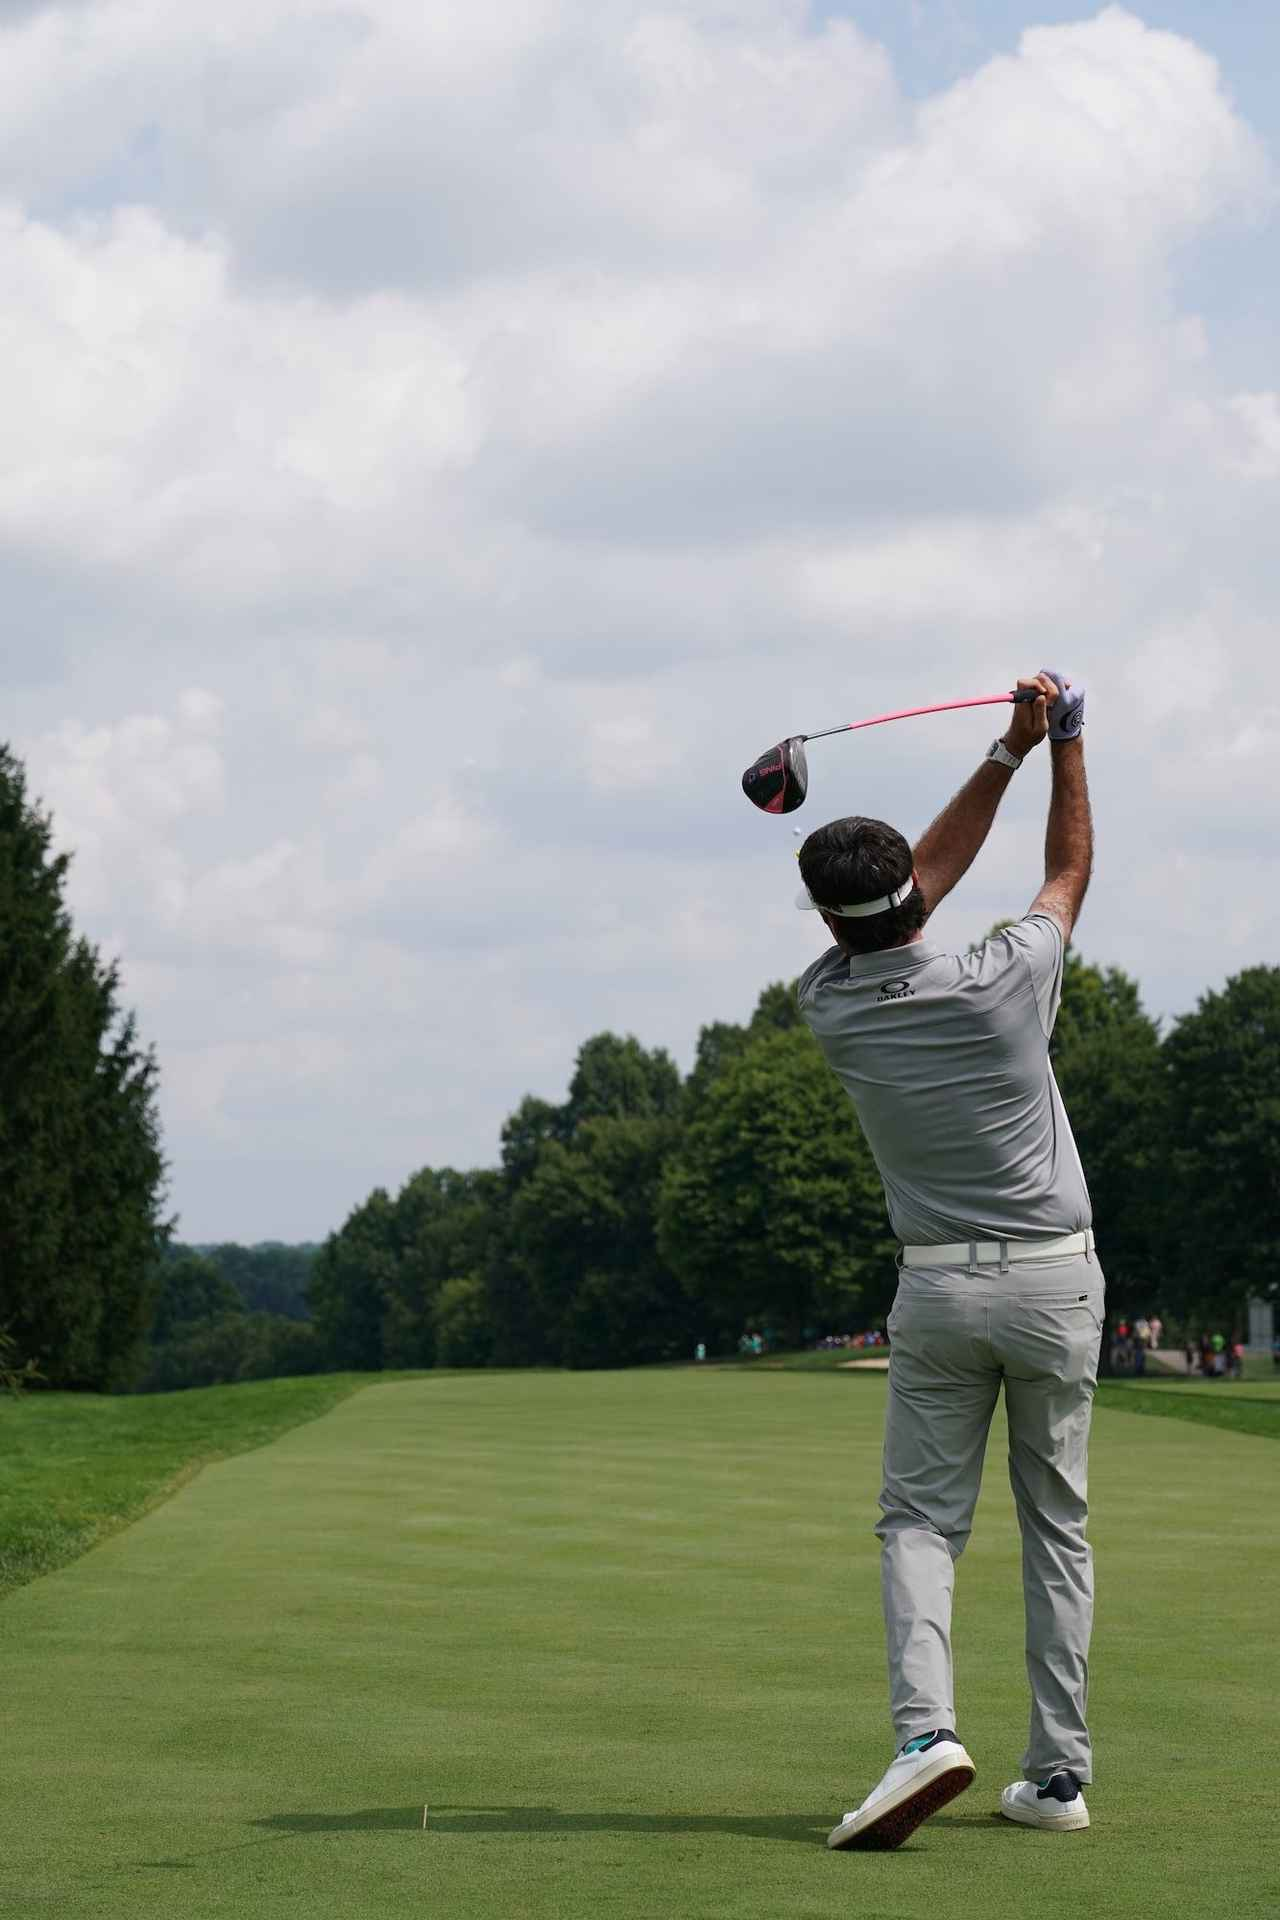 Images : 21番目の画像 - 強烈! バッバ・ワトソンのドライバーショット - みんなのゴルフダイジェスト